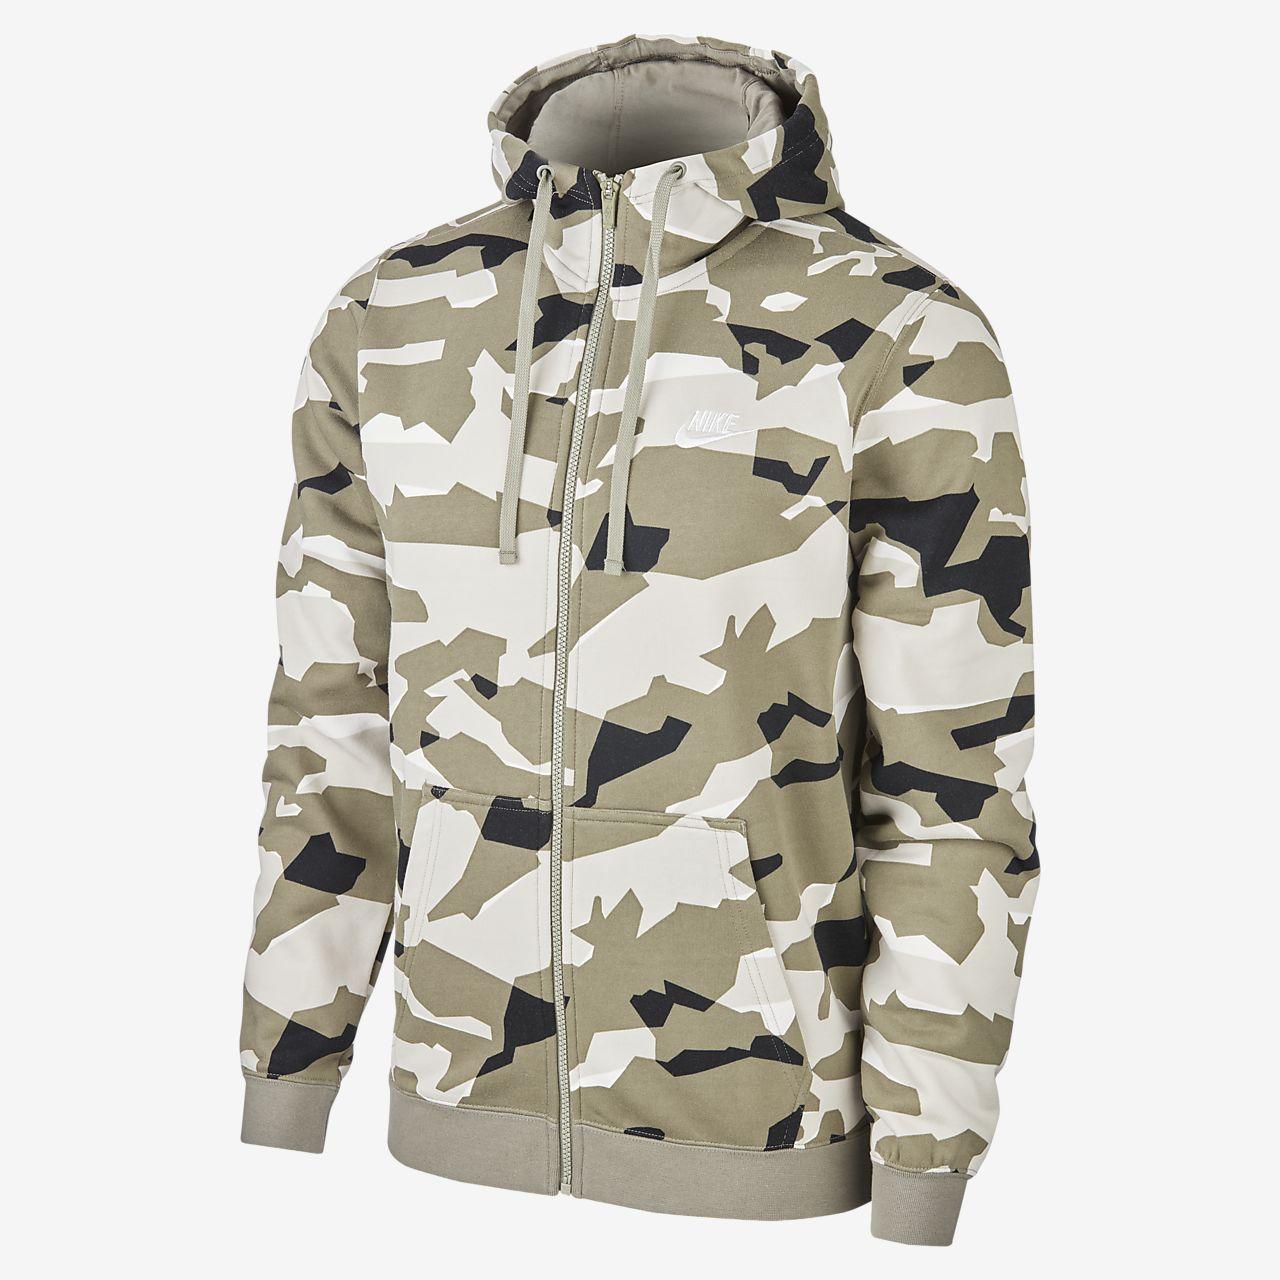 8255f4c577 Nike pulóver , Férfi ruházat | pulóver , nike , Nike pulóver